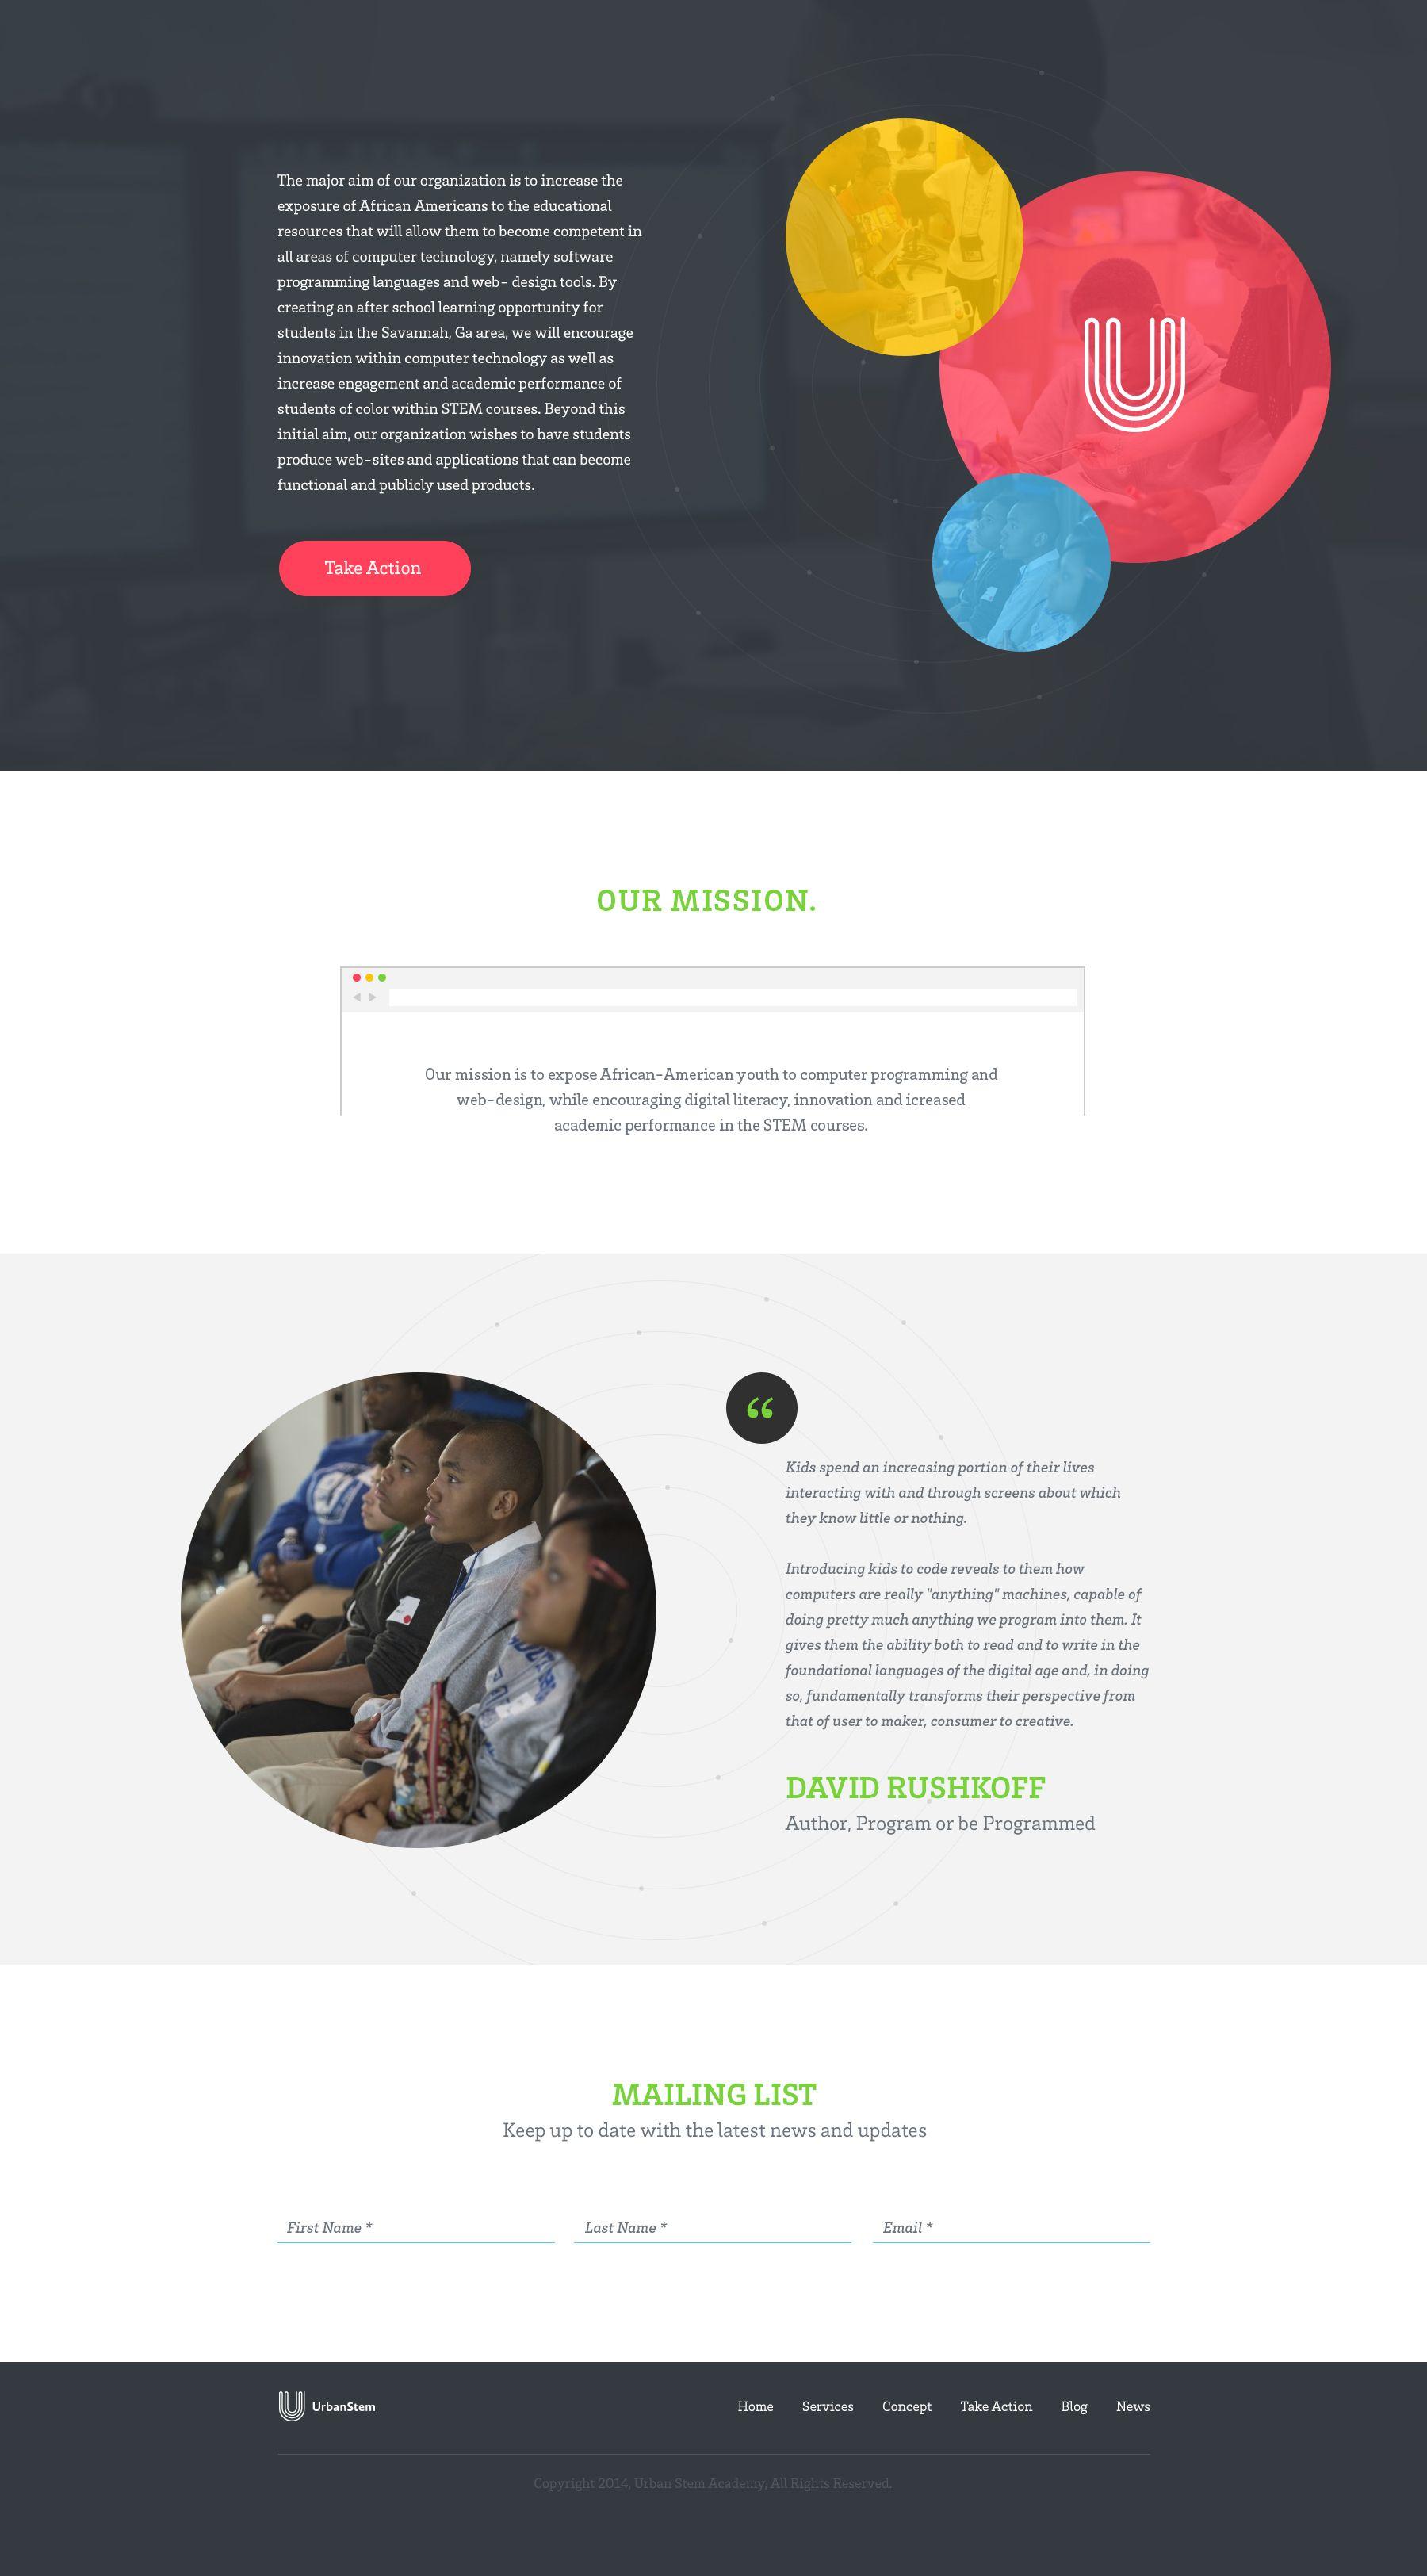 urban stem academy our mission by myles kedrowski web design